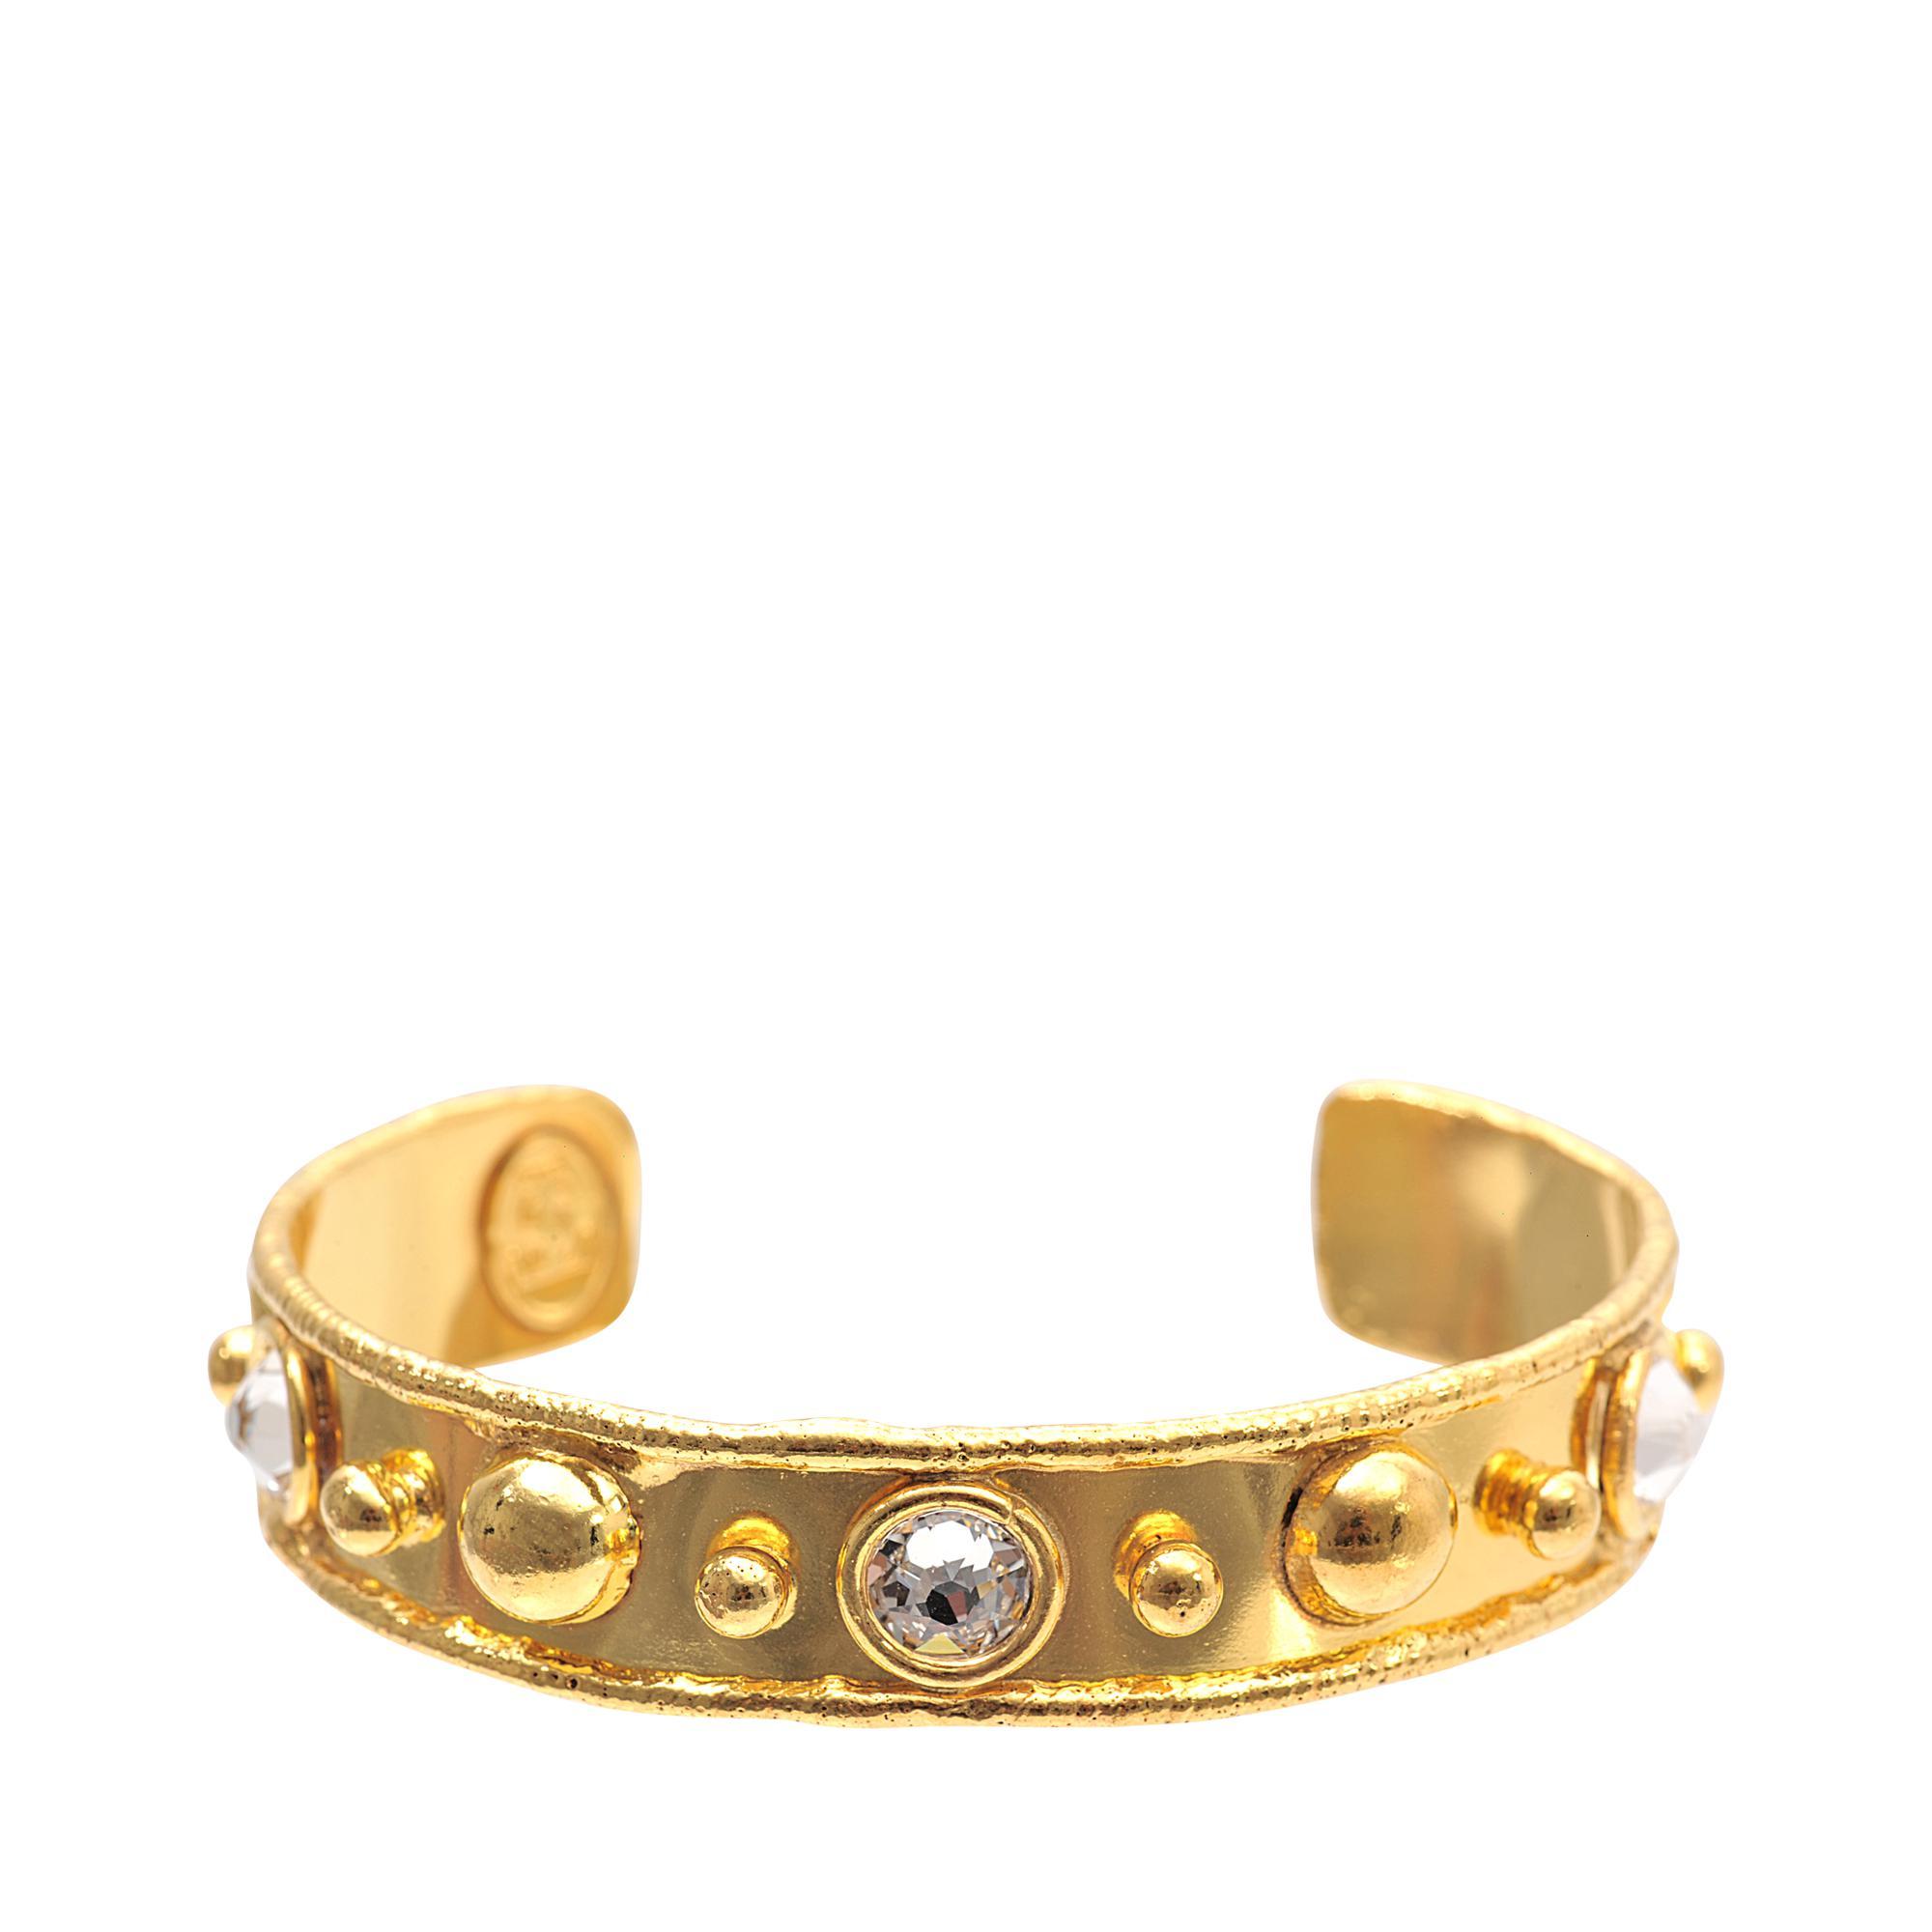 Sylvia Toledano Stone Massaii Cuff Bracelet in Gold-Plated Brass I88Nr5EQyP